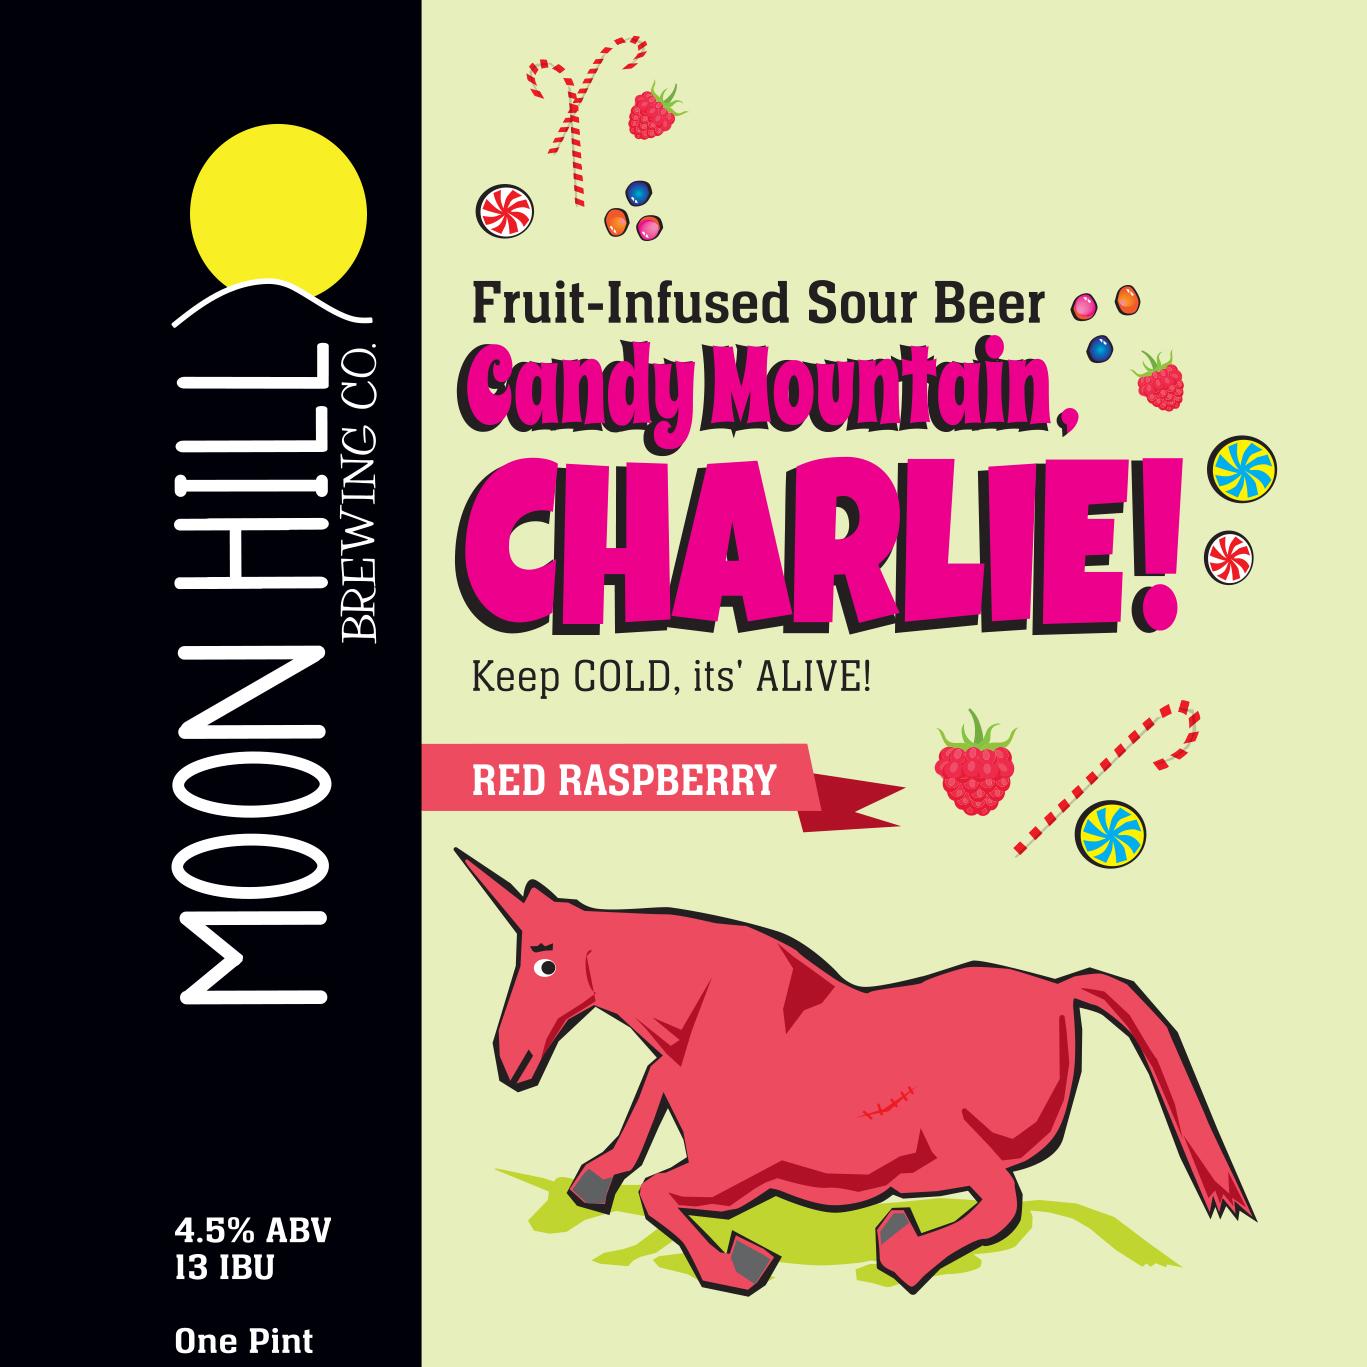 Puff N Stuf - Moon Hill Brewing Co